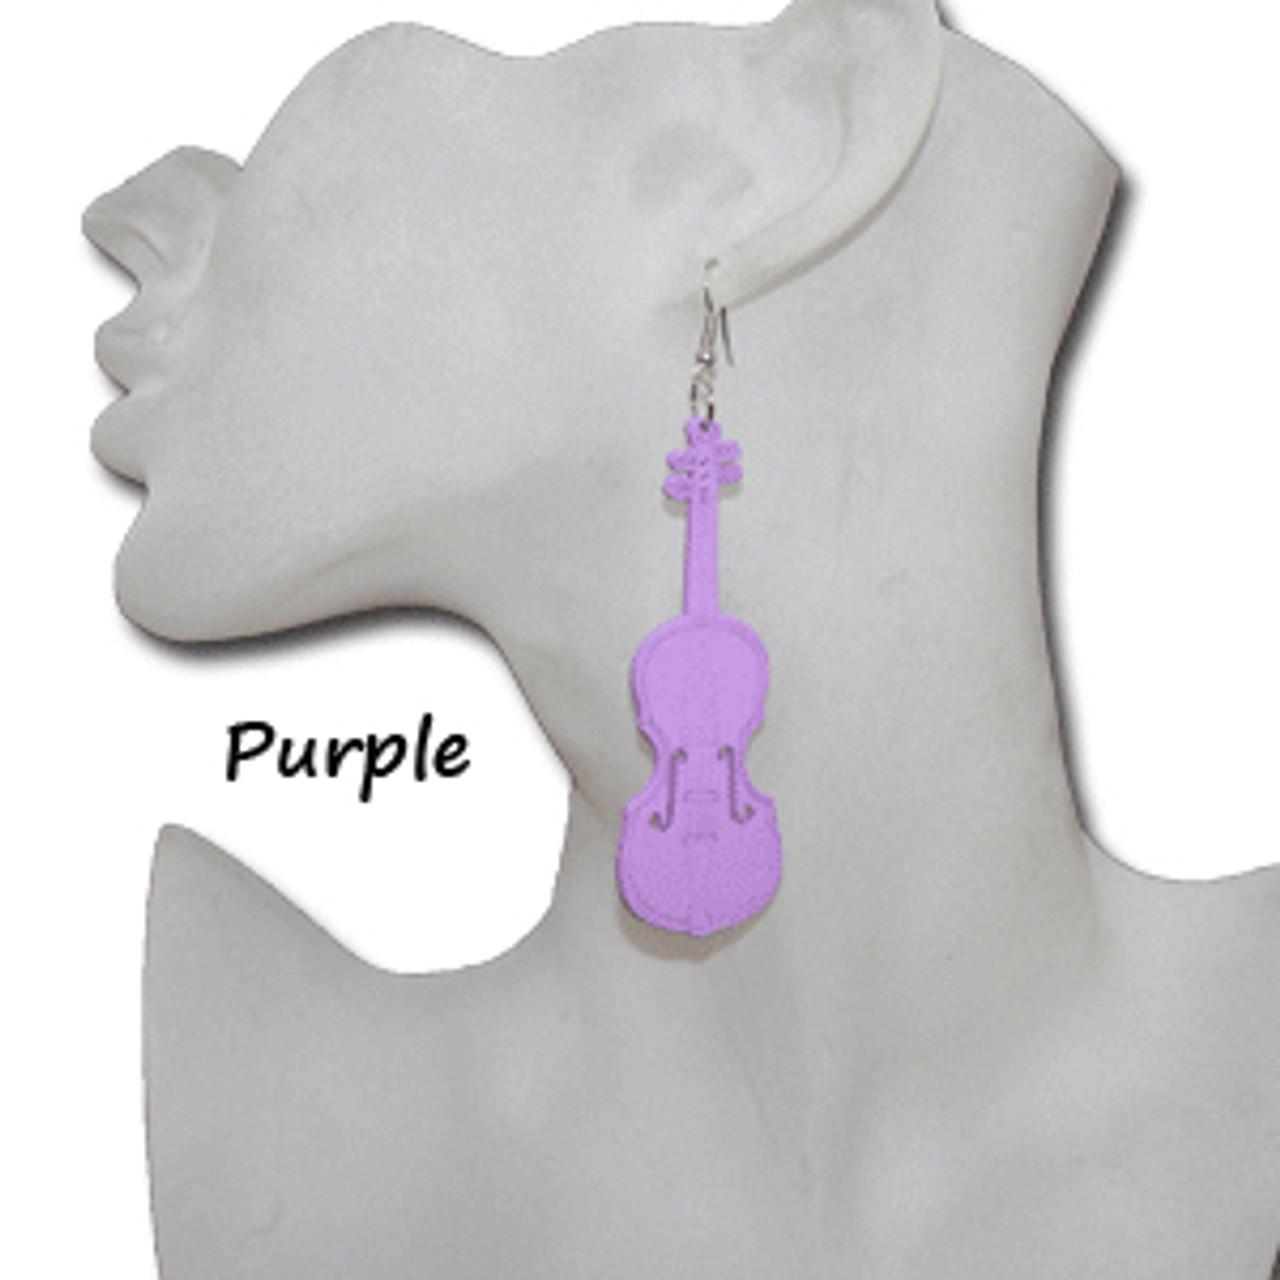 Musical instrument earrings